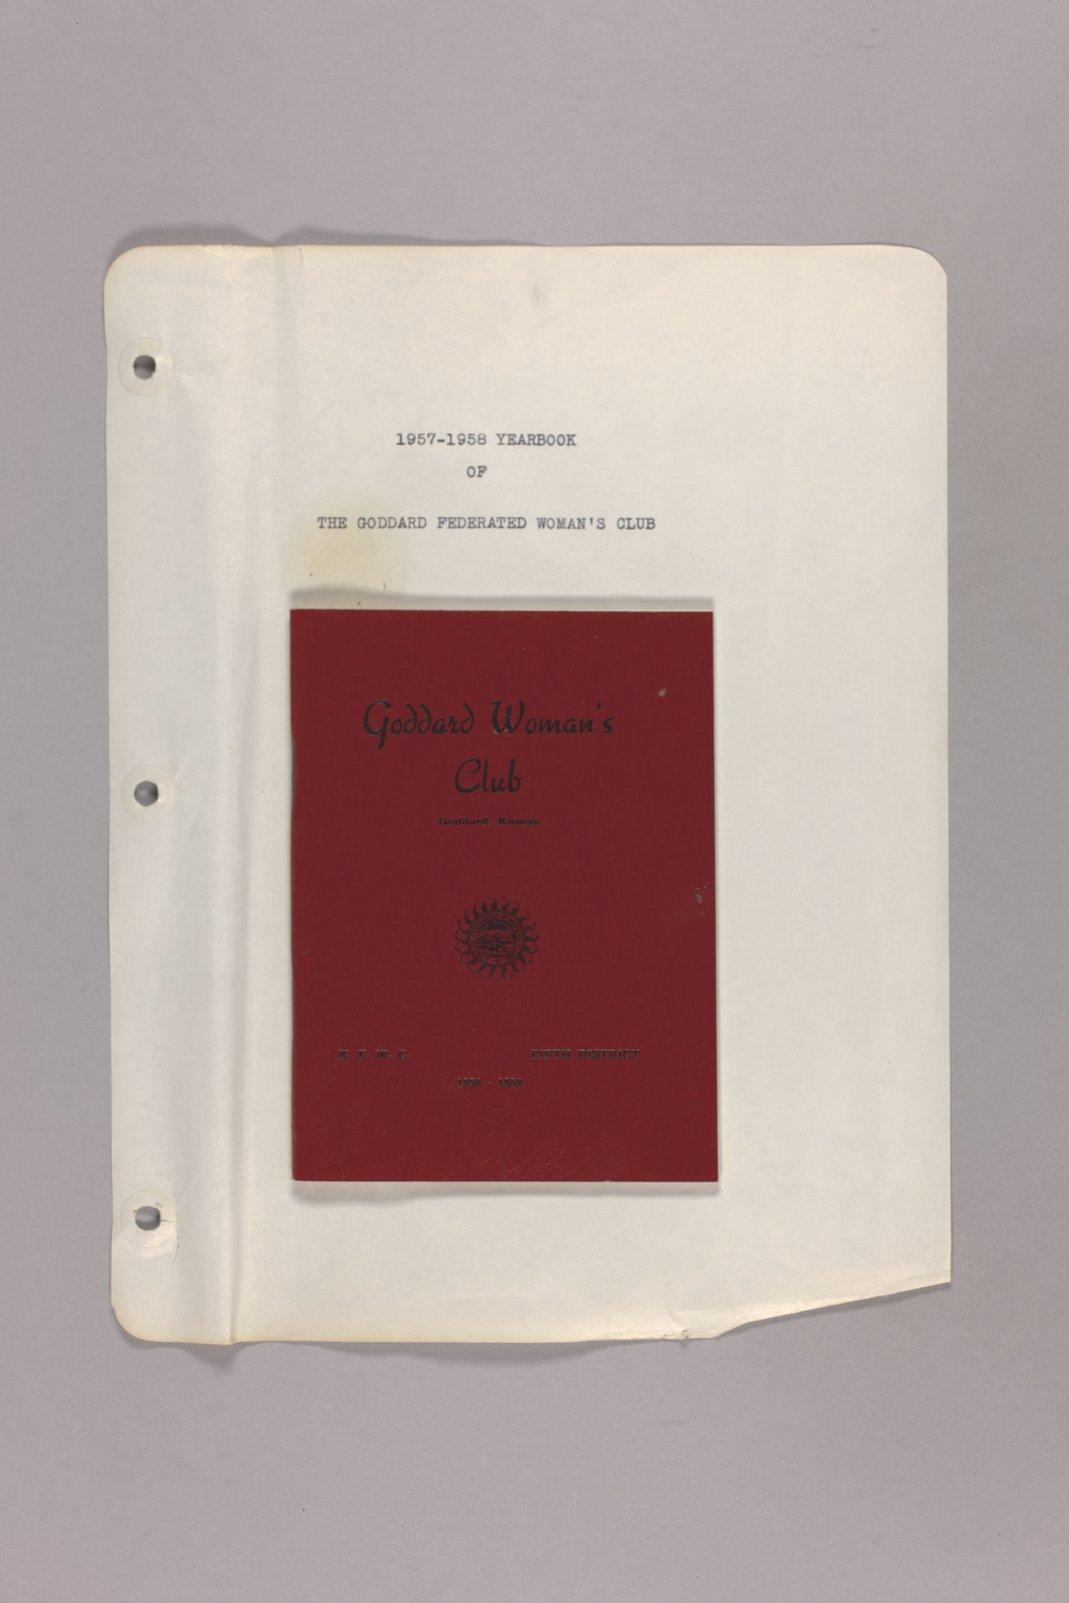 Goddard Woman's Club pressbook - Yearbook: 1957-58